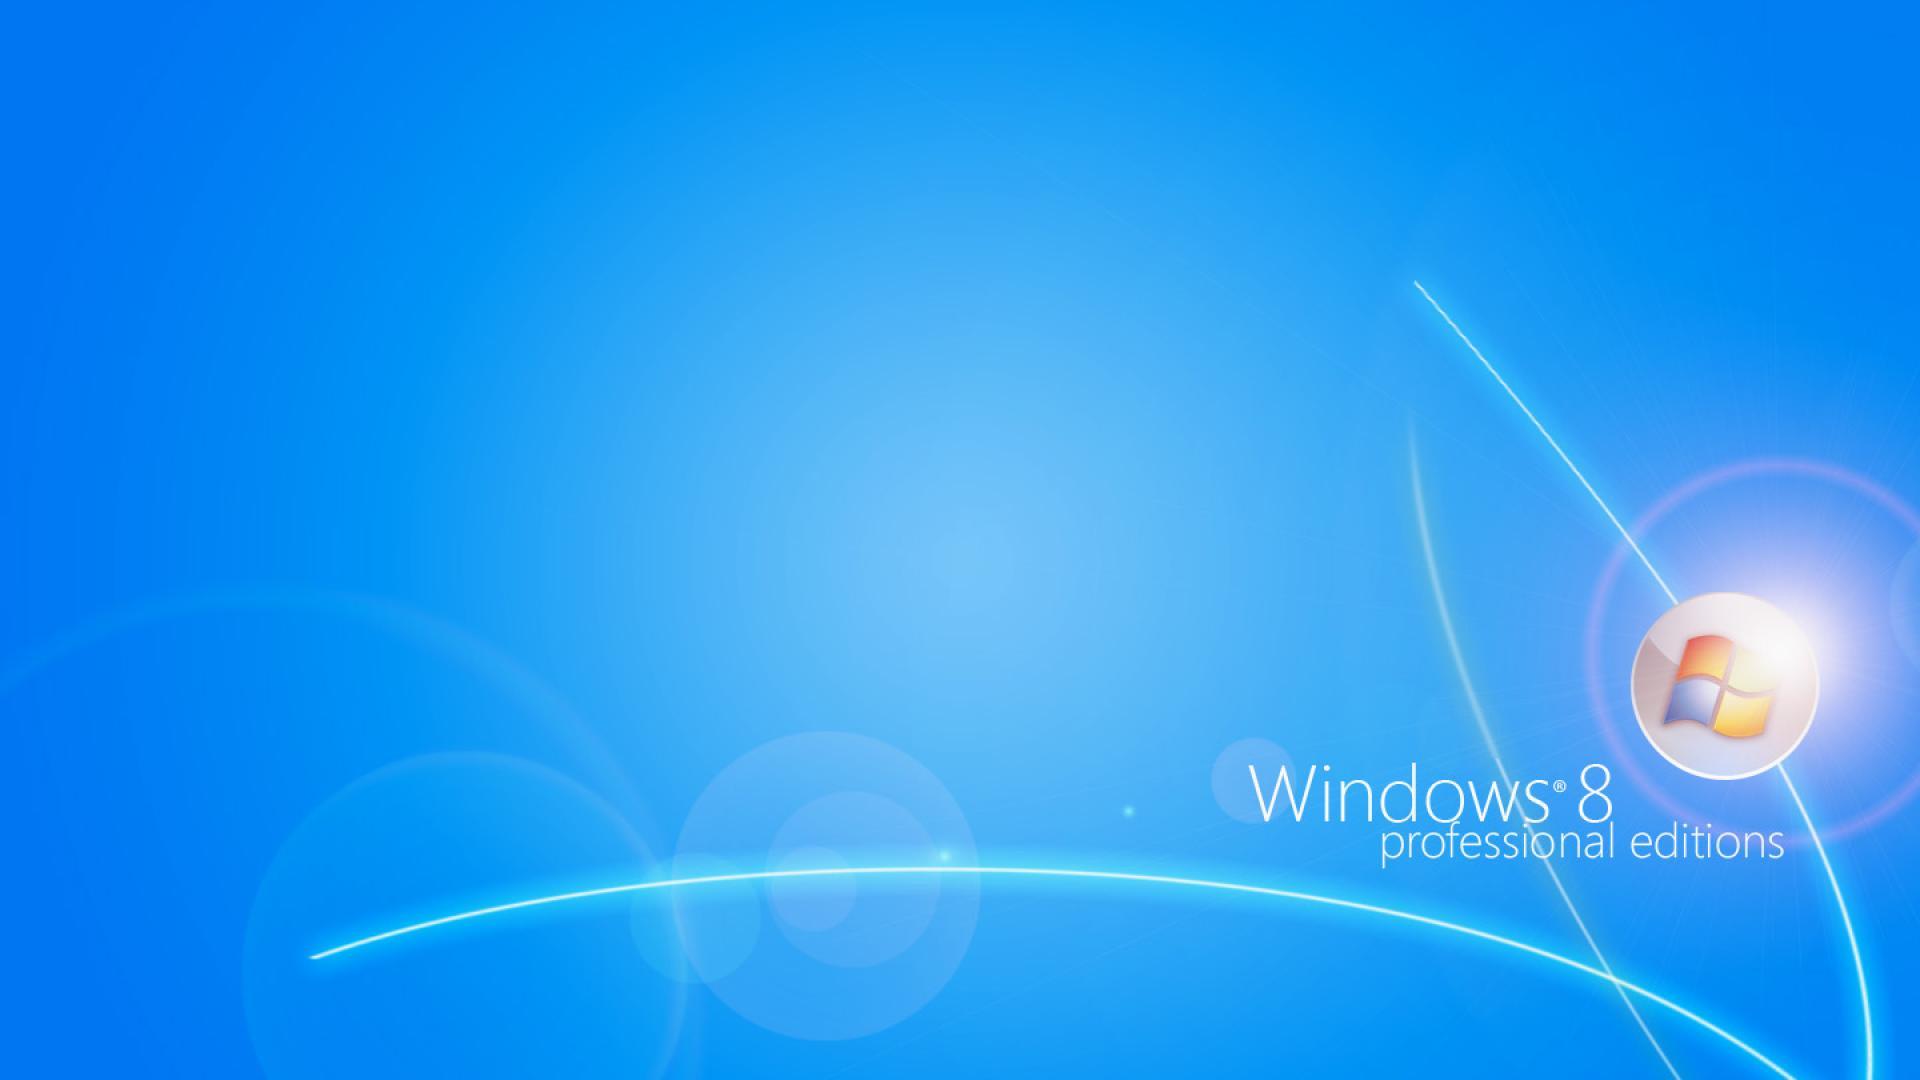 windows wallpaper hd 1920x1080 free download